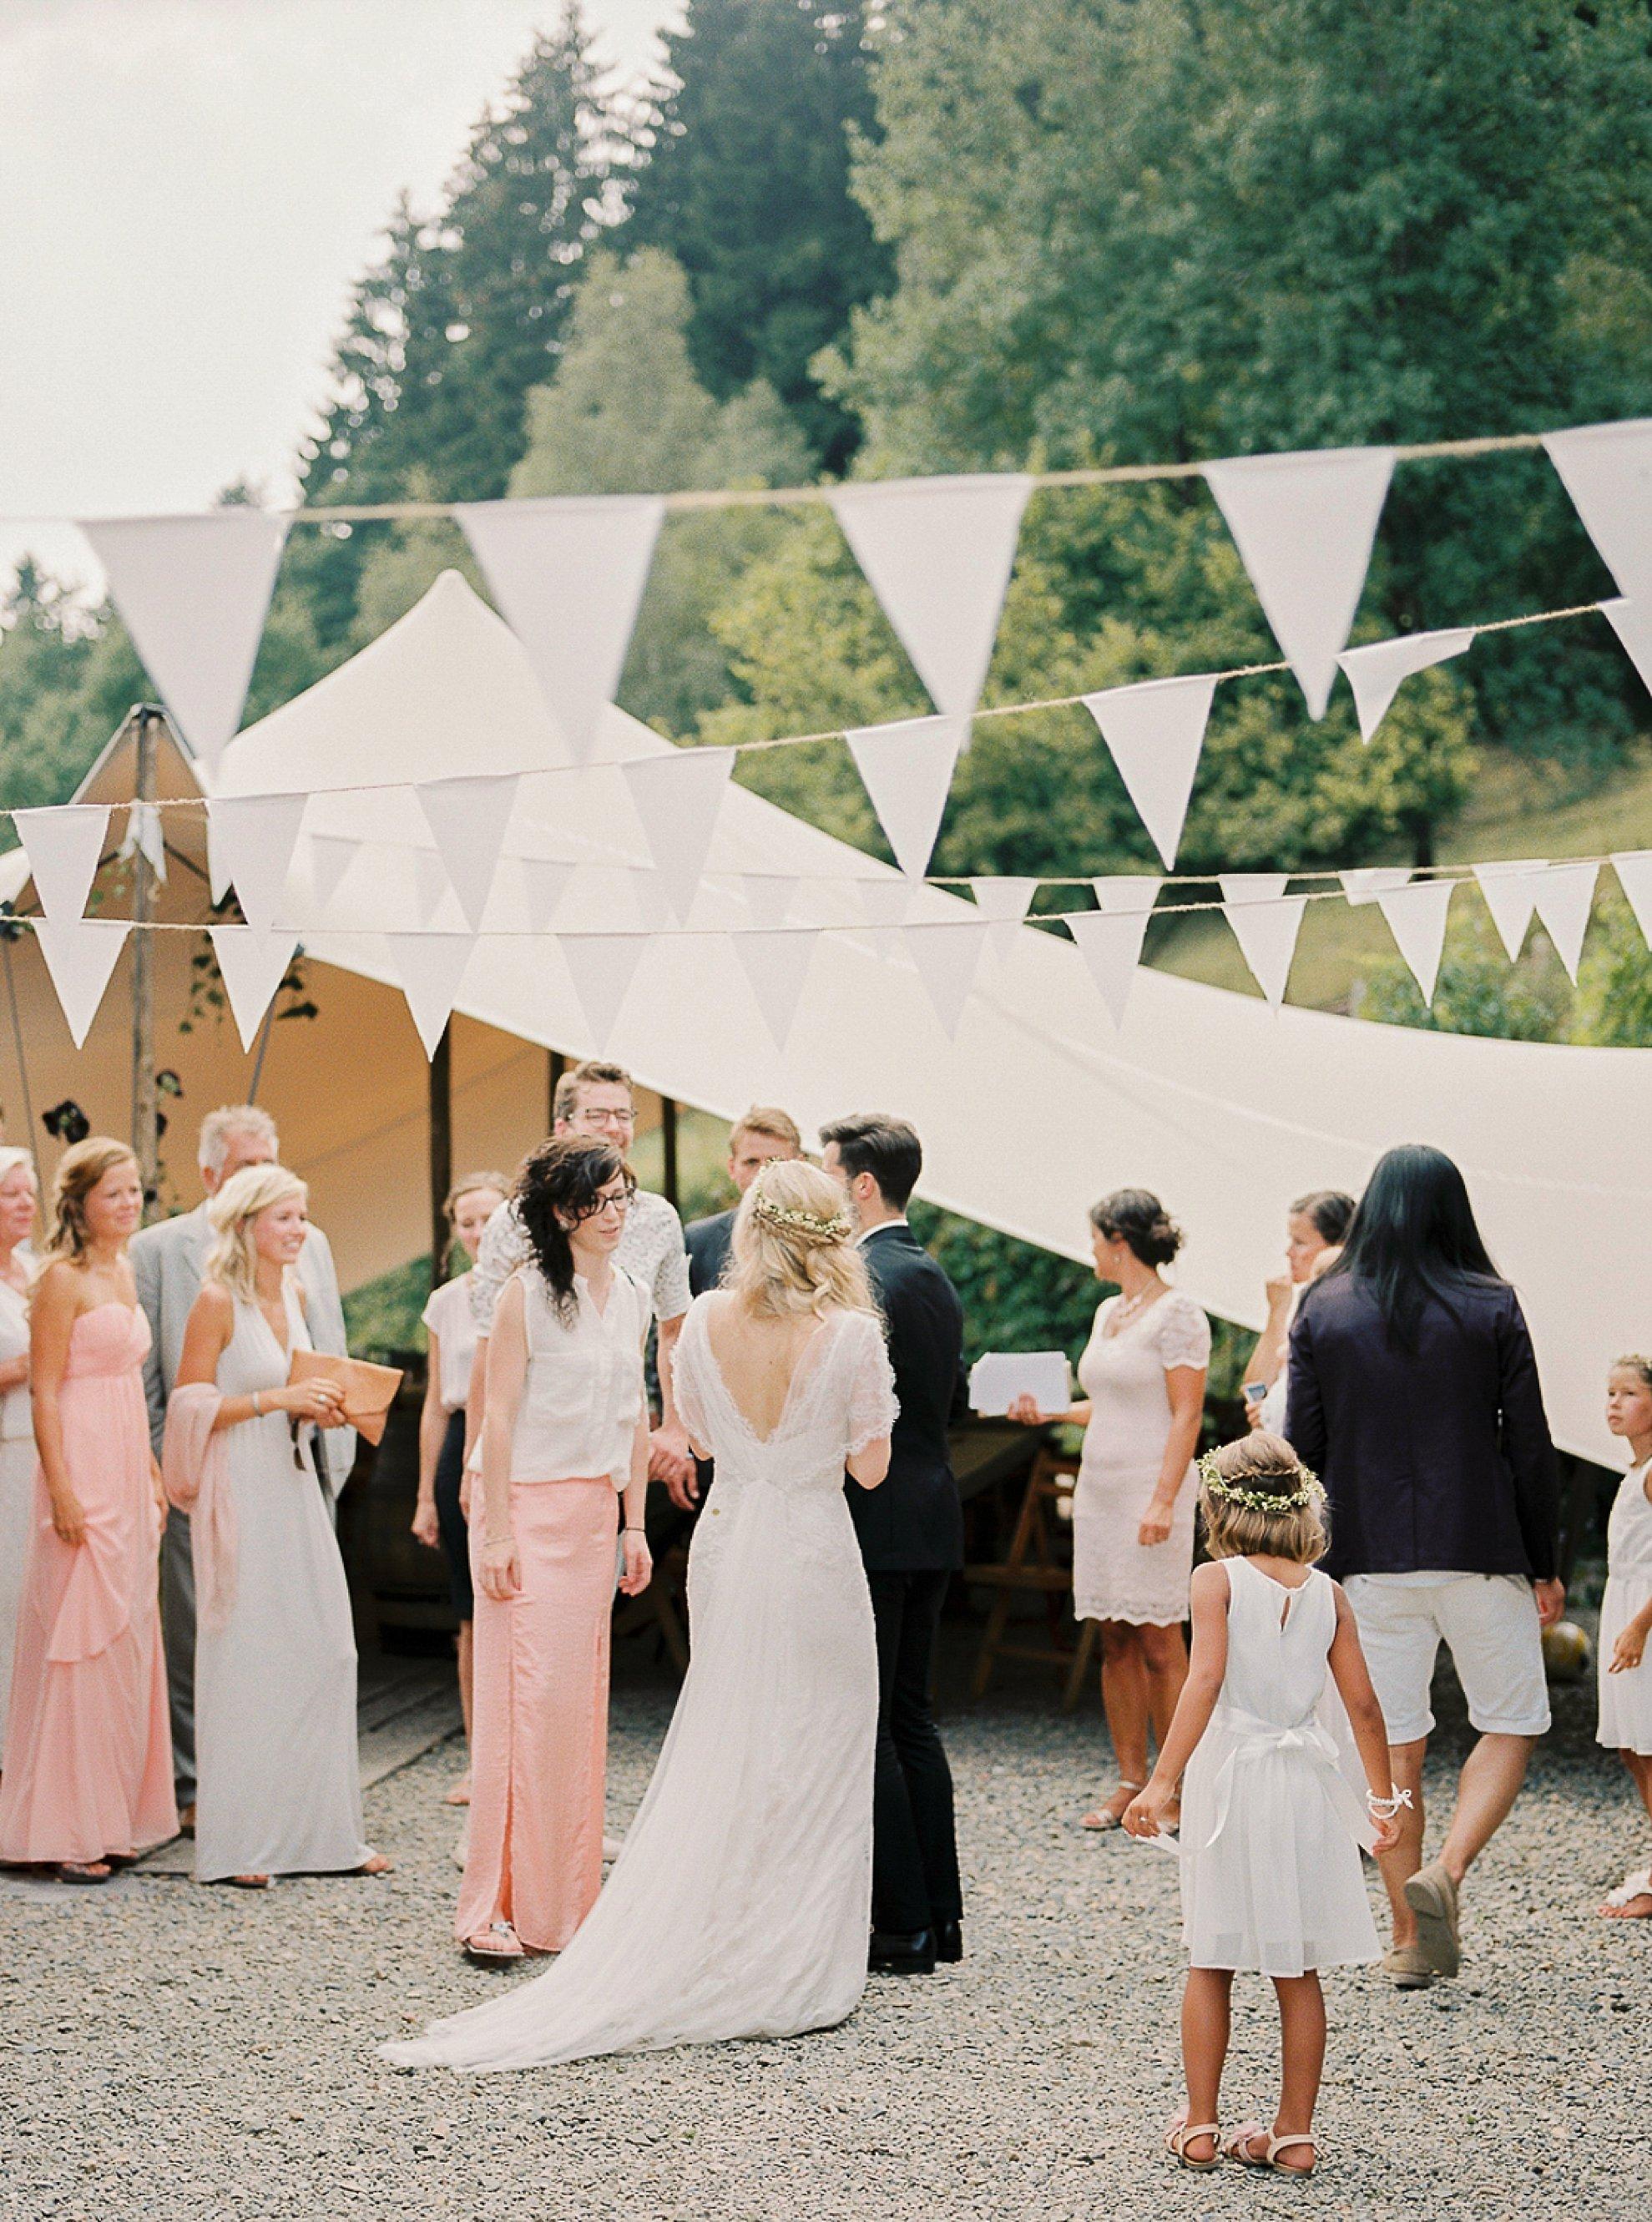 Amanda-Drost-Fotografie-Belgie-Photography-Wedding_0022.jpg